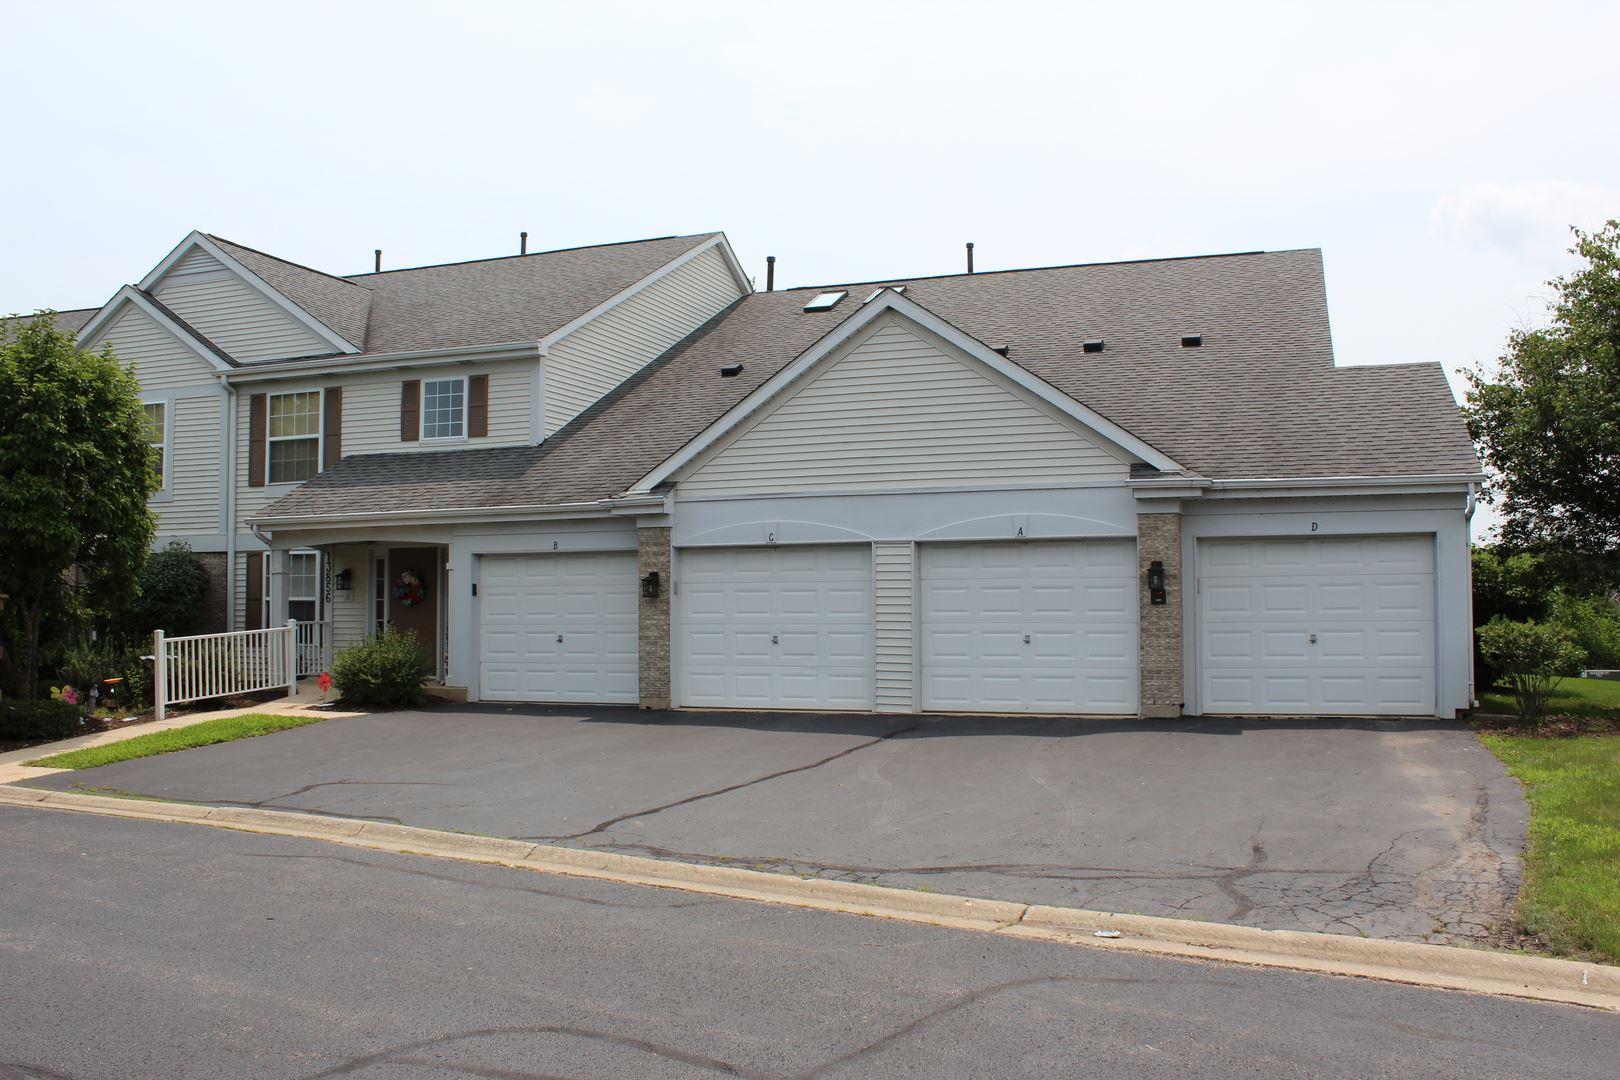 Photo of 13856 S Balsam Lane #D, Plainfield, IL 60544 (MLS # 11164802)